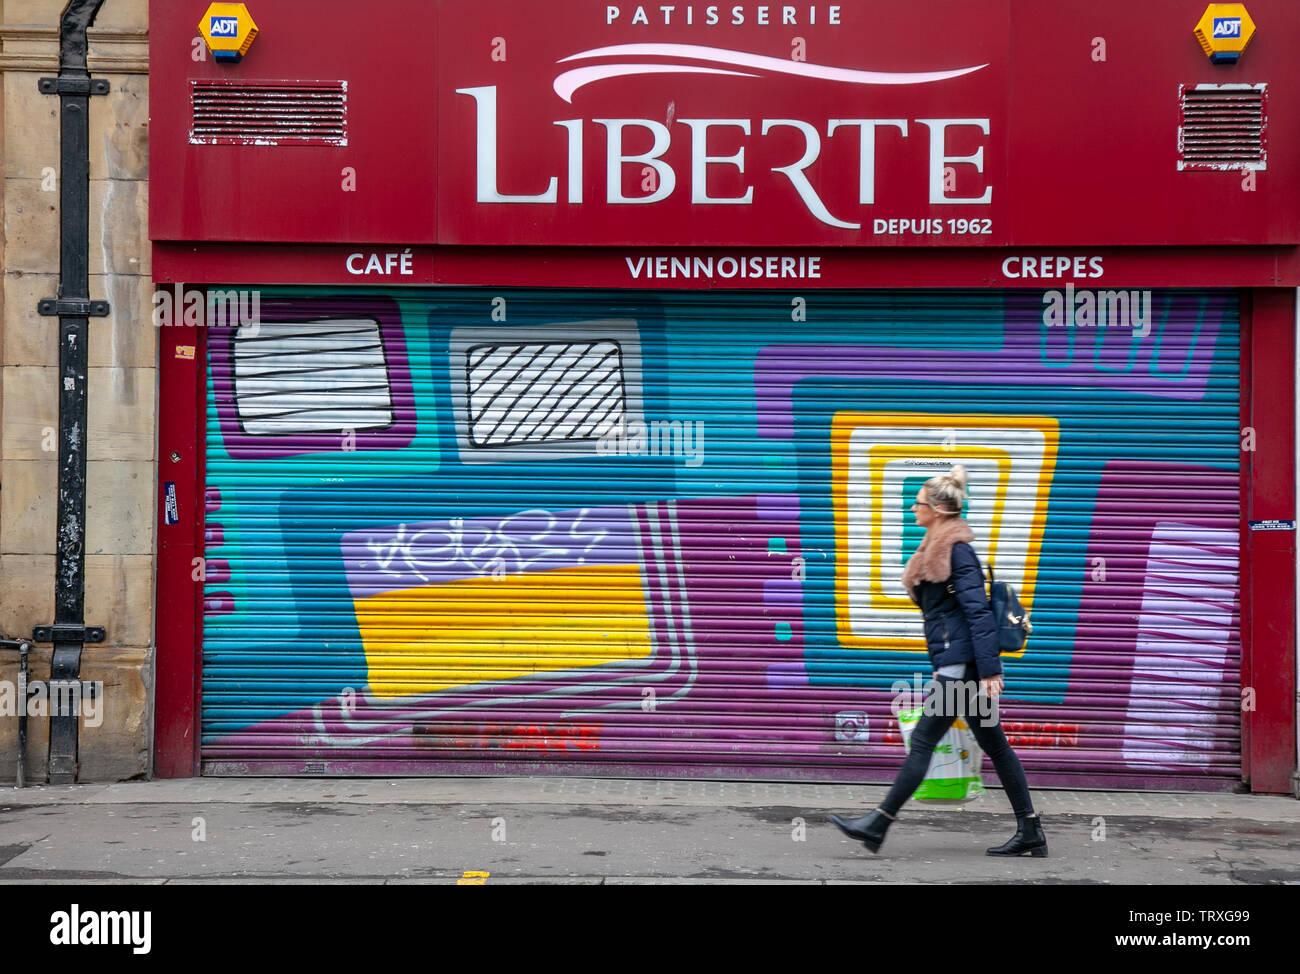 Closed Liberte patisserie in Manchester, UK - Stock Image